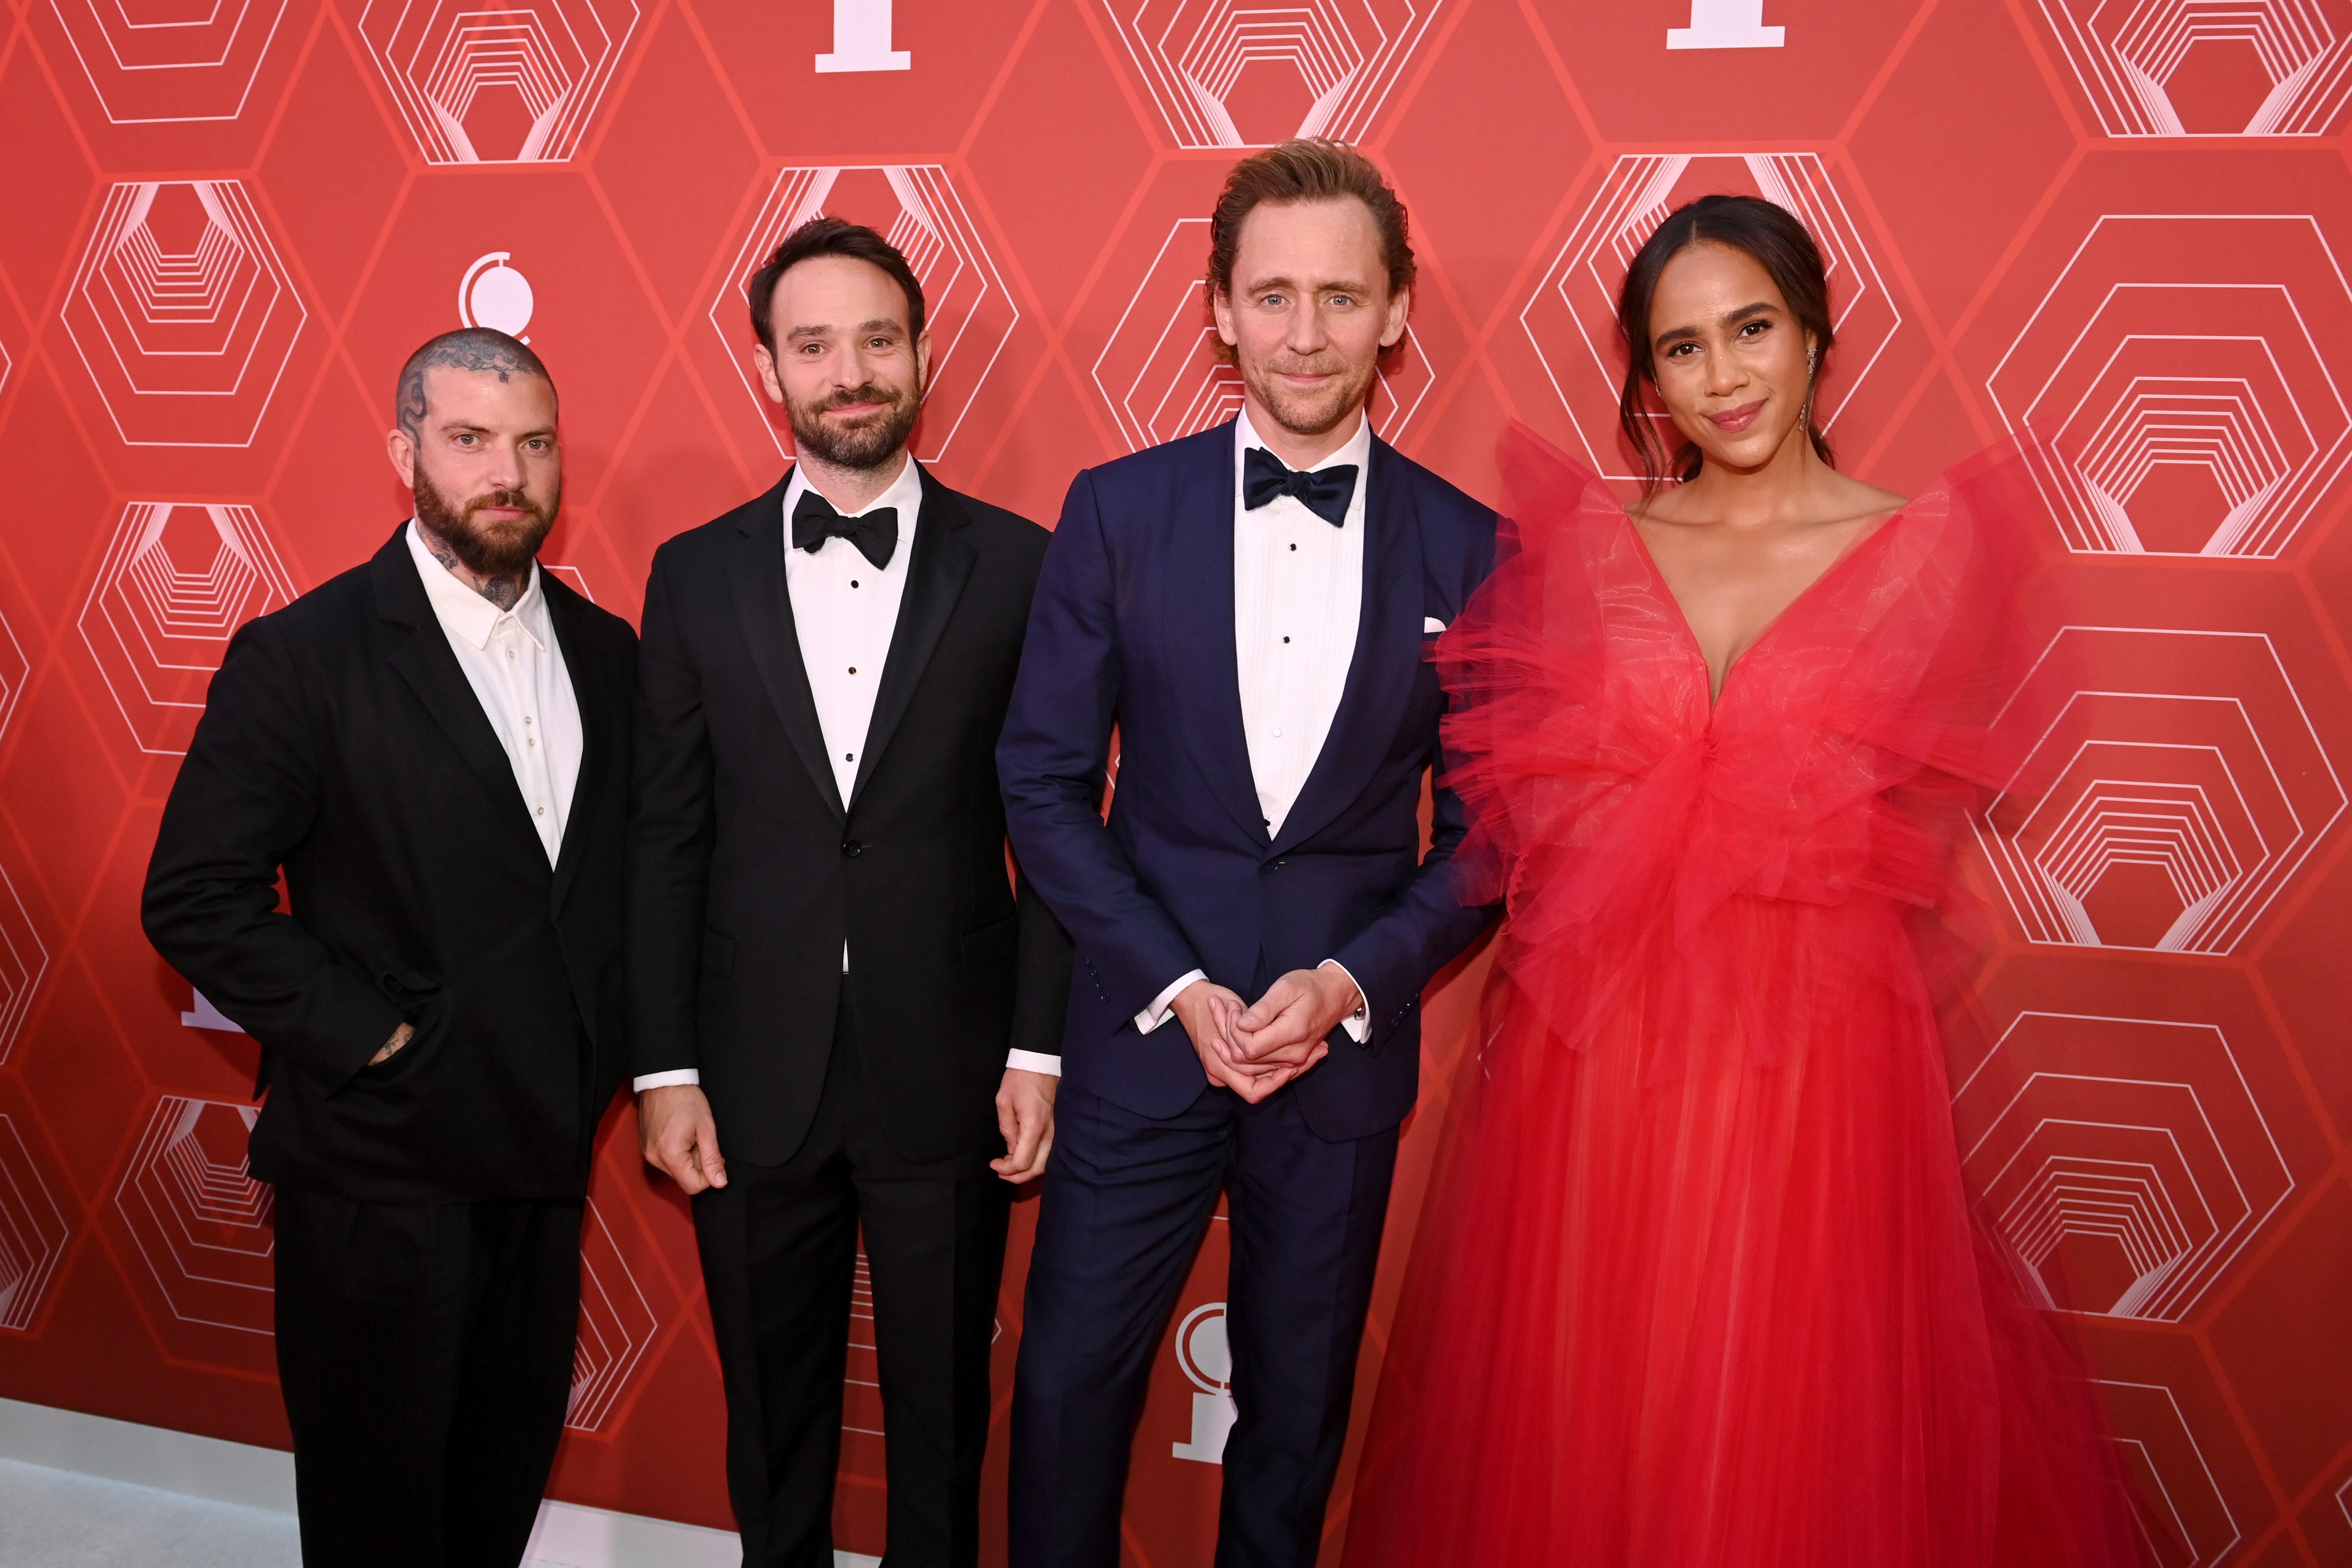 charlie-cox-tom-hiddleston-betrayal-tony-awards.jpg